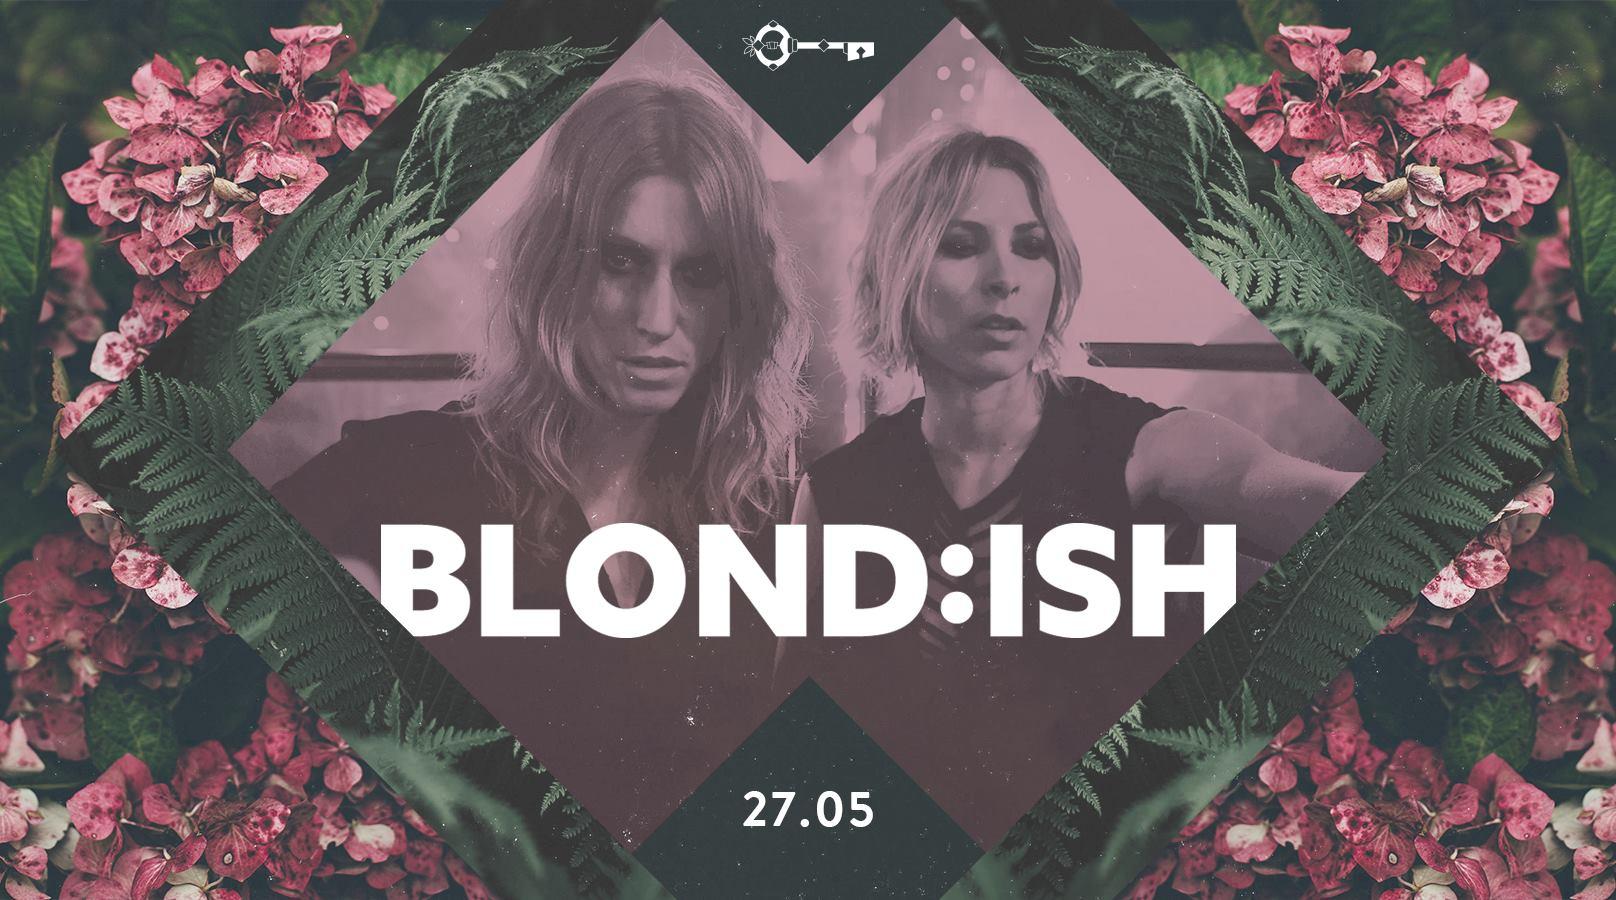 Baner zapowidający koncert Blondish